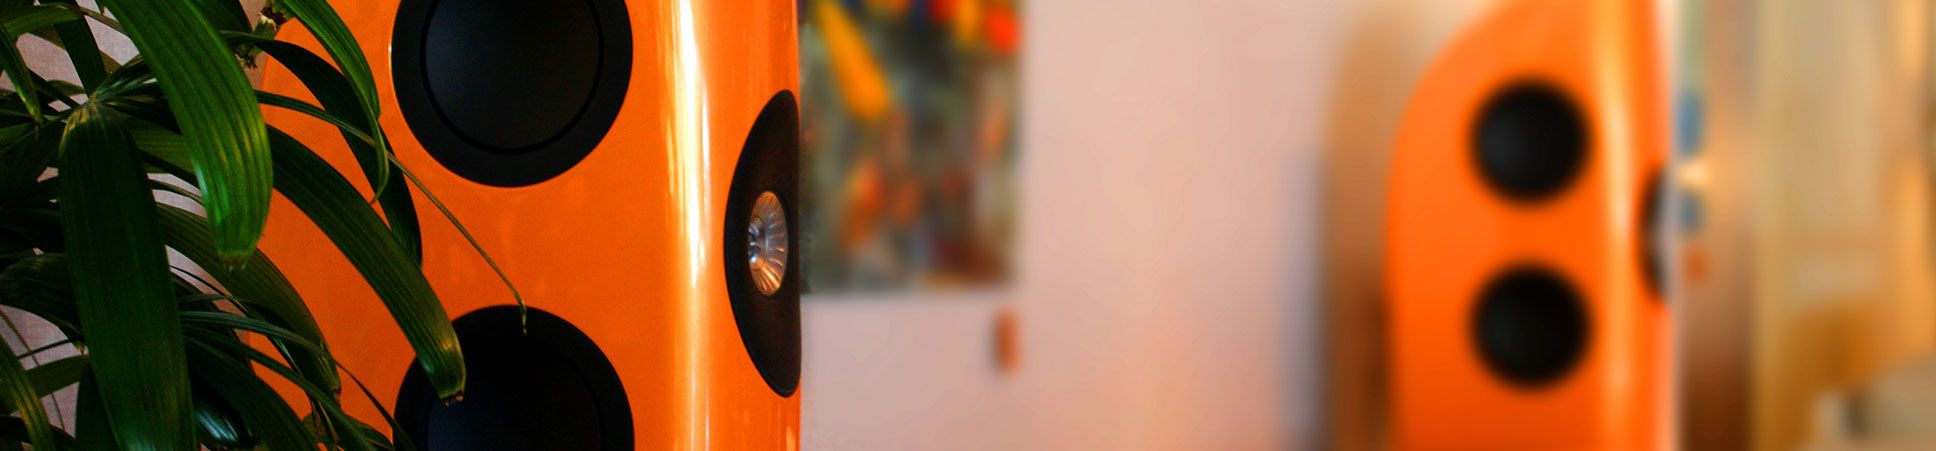 Kefblade-slide-05